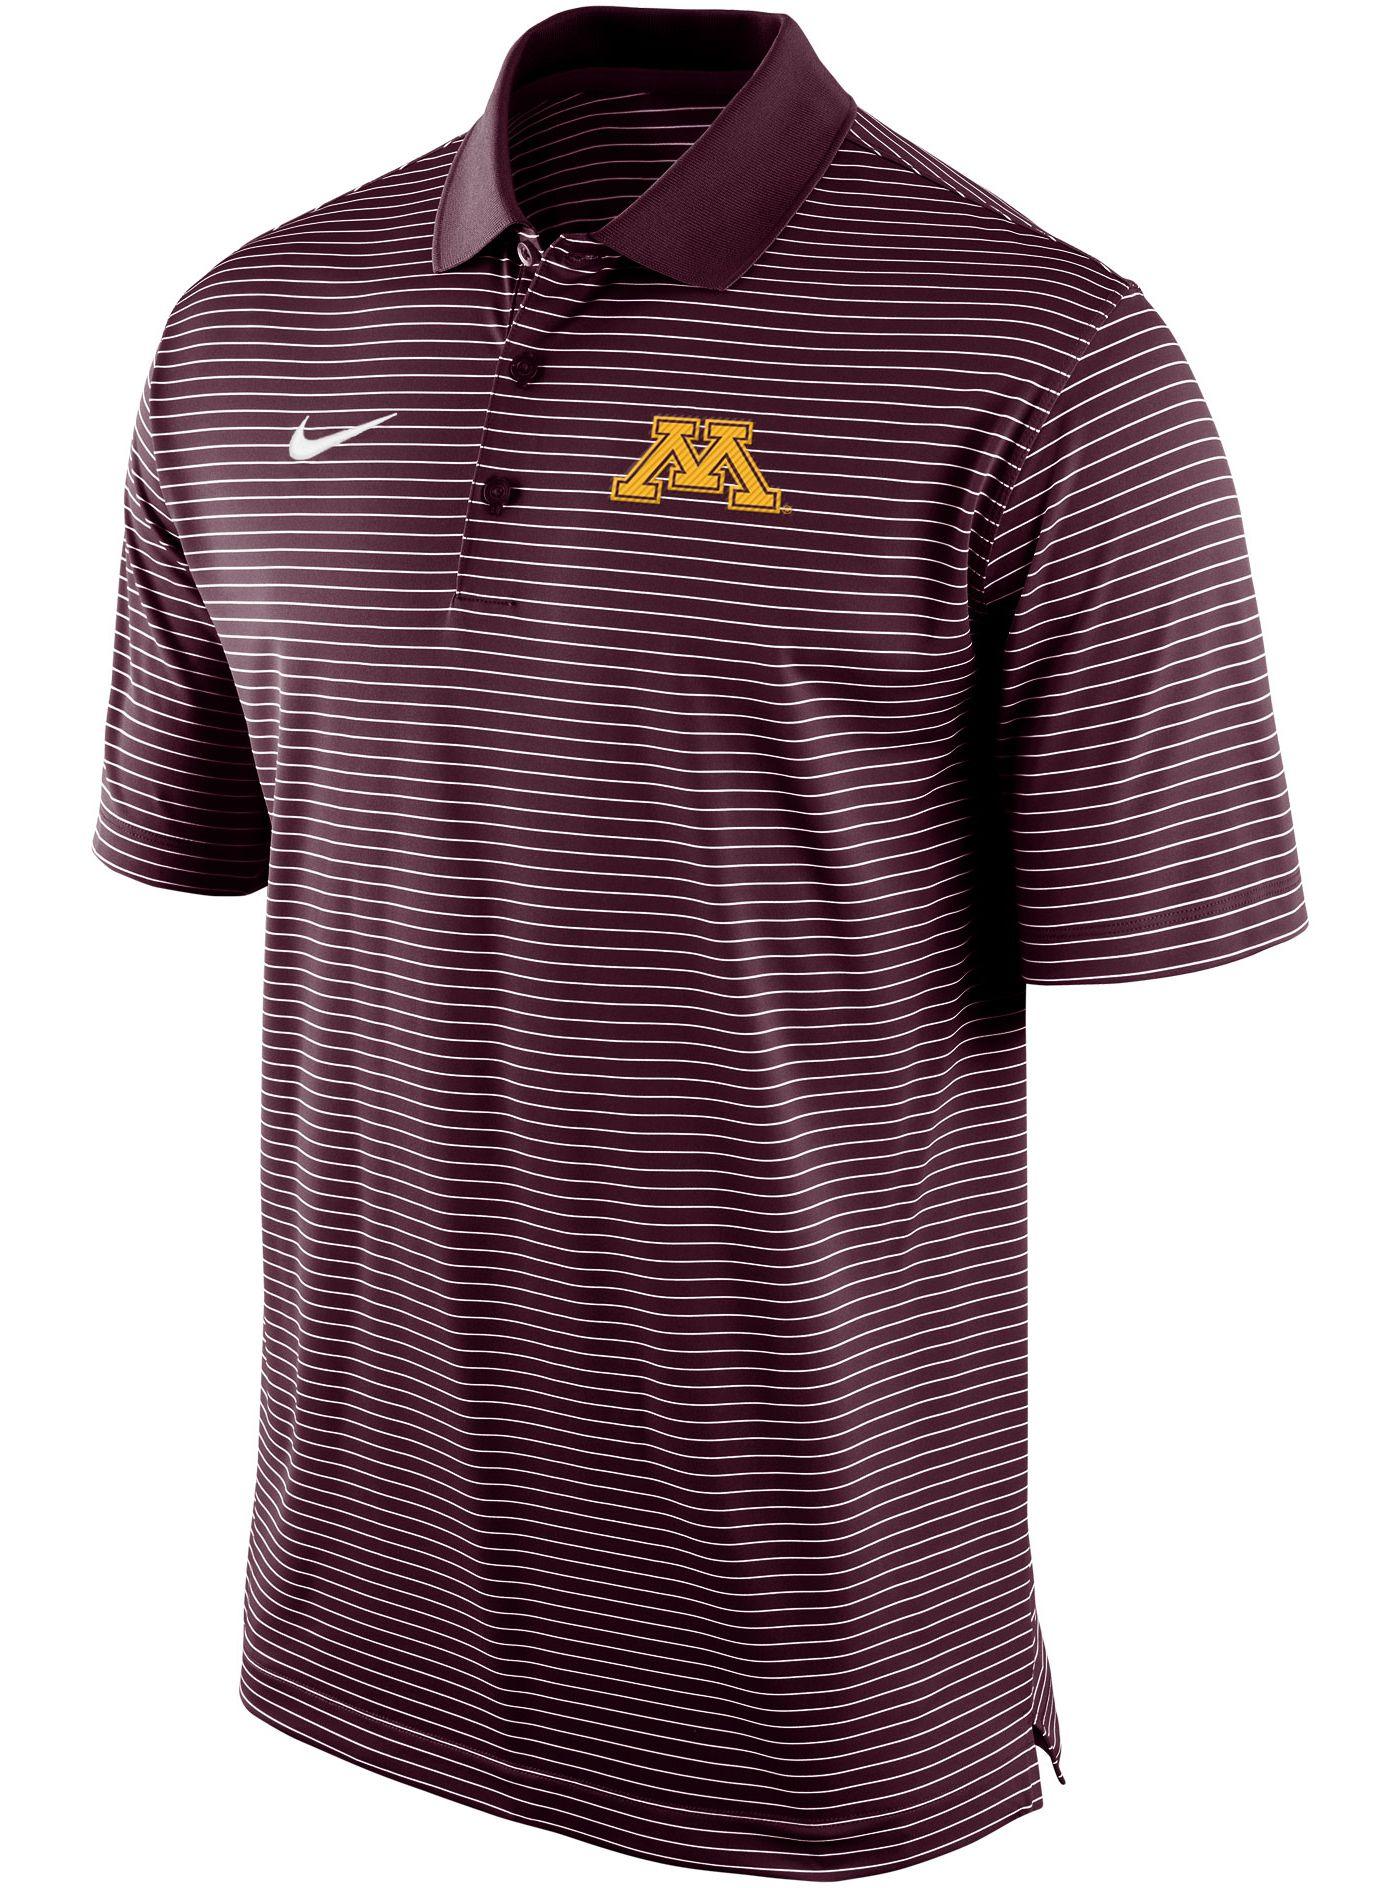 Nike Men's Minnesota Golden Gophers Maroon Stadium Striped Polo